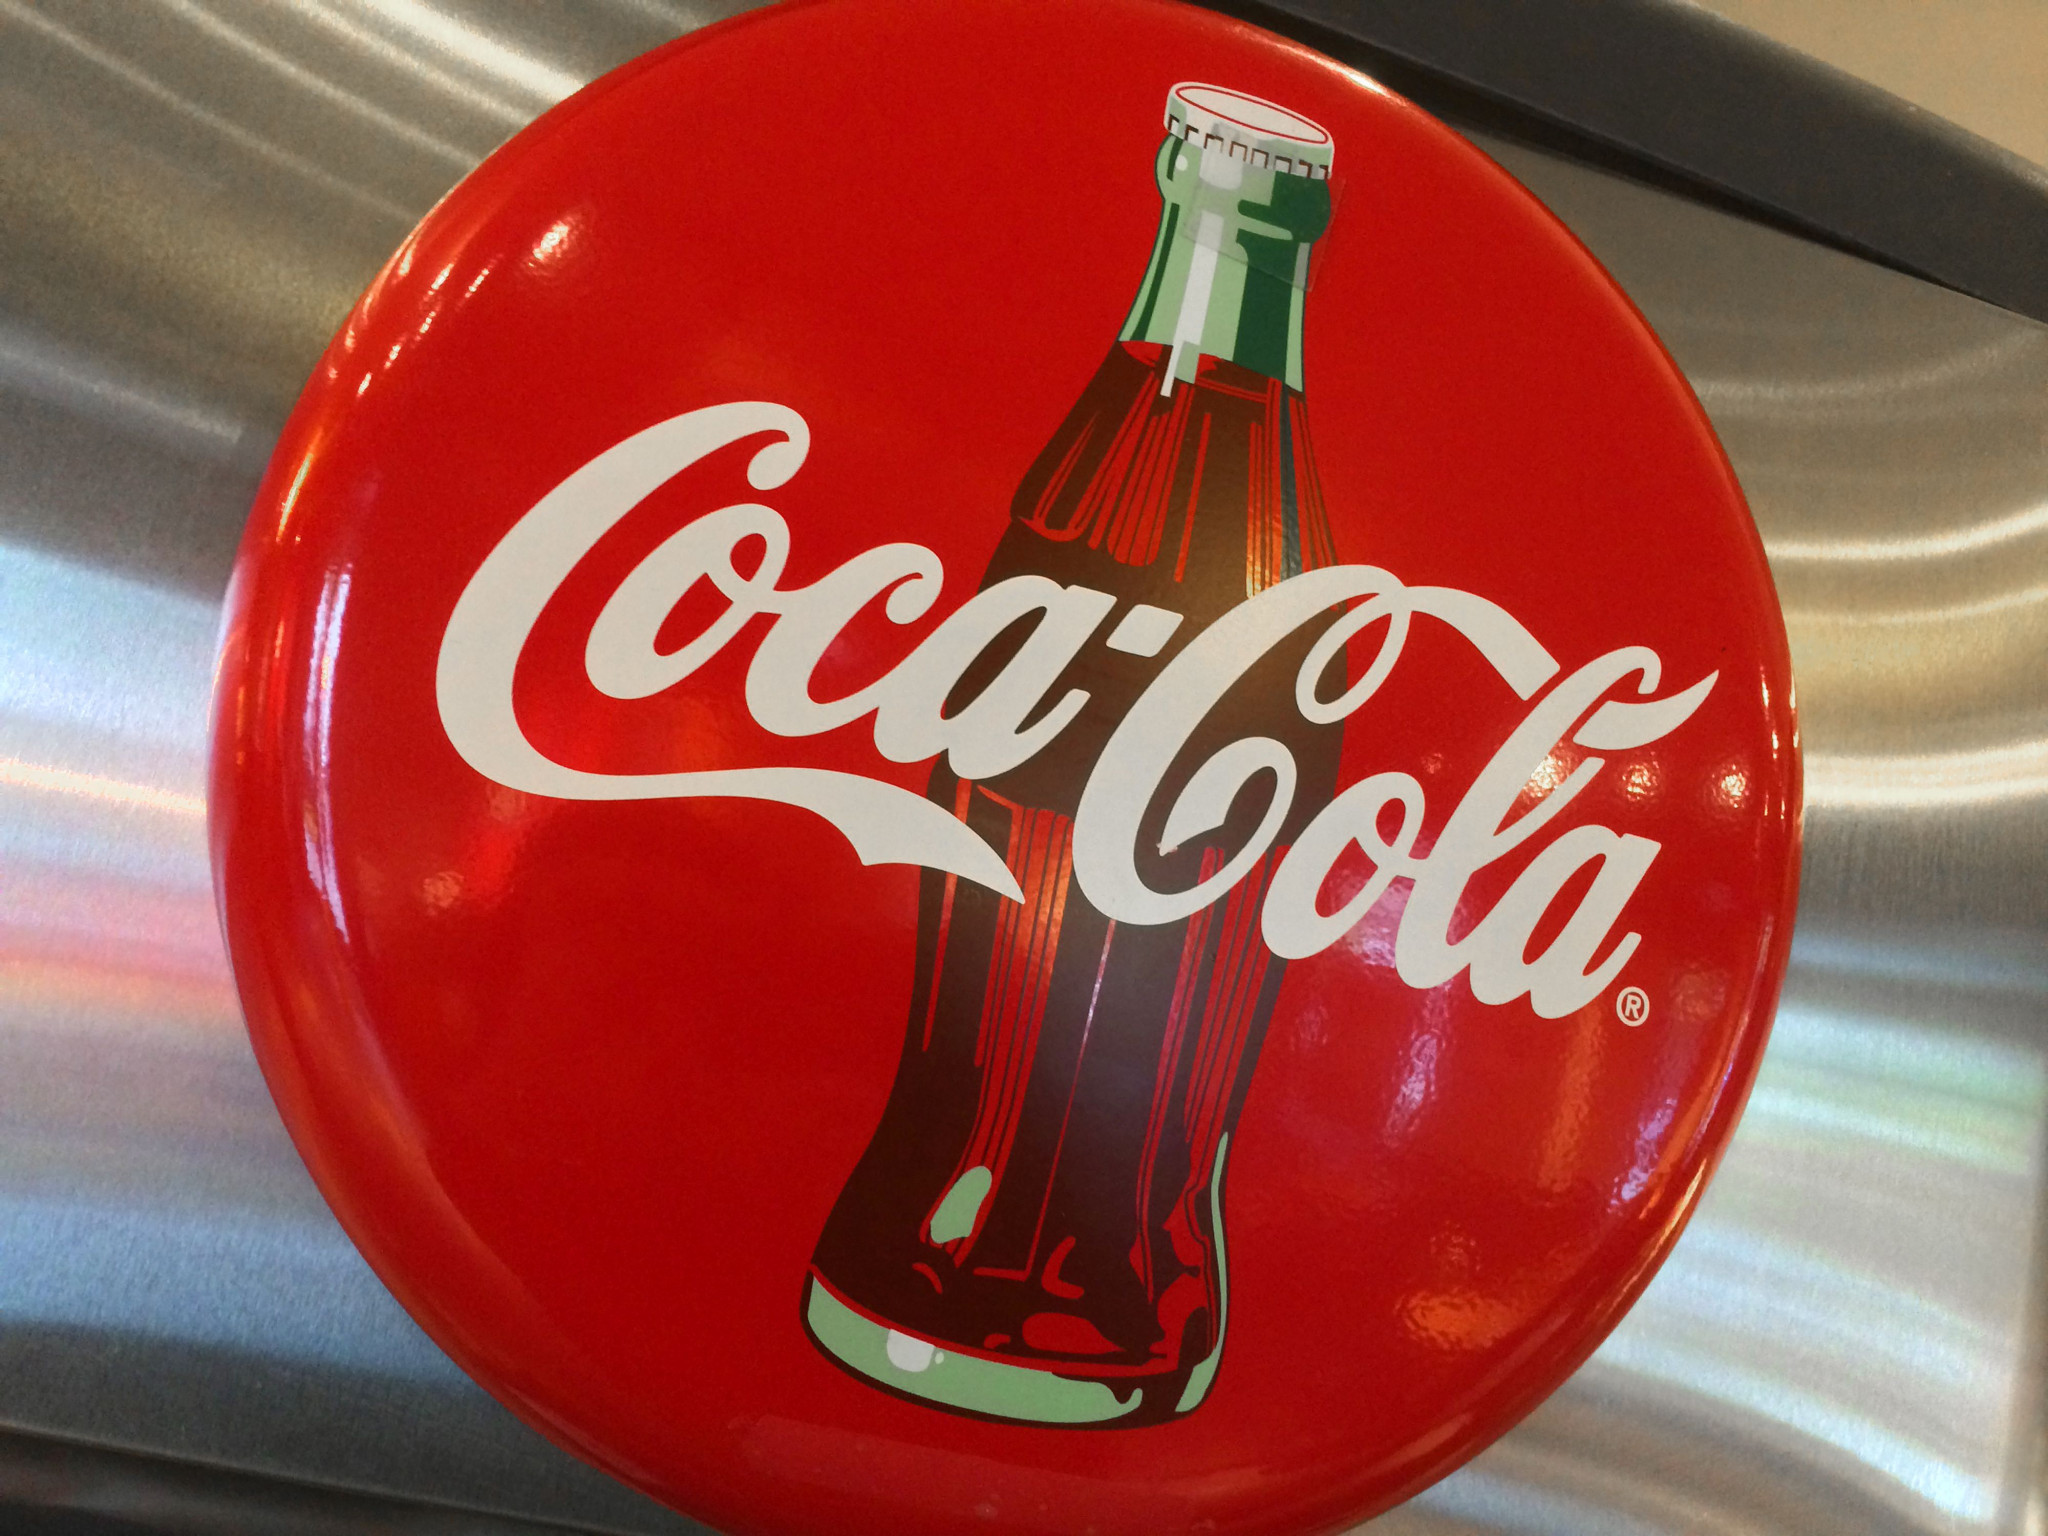 Coca-Cola and Ajinomoto expand sponsorship deals with Tokyo 2020